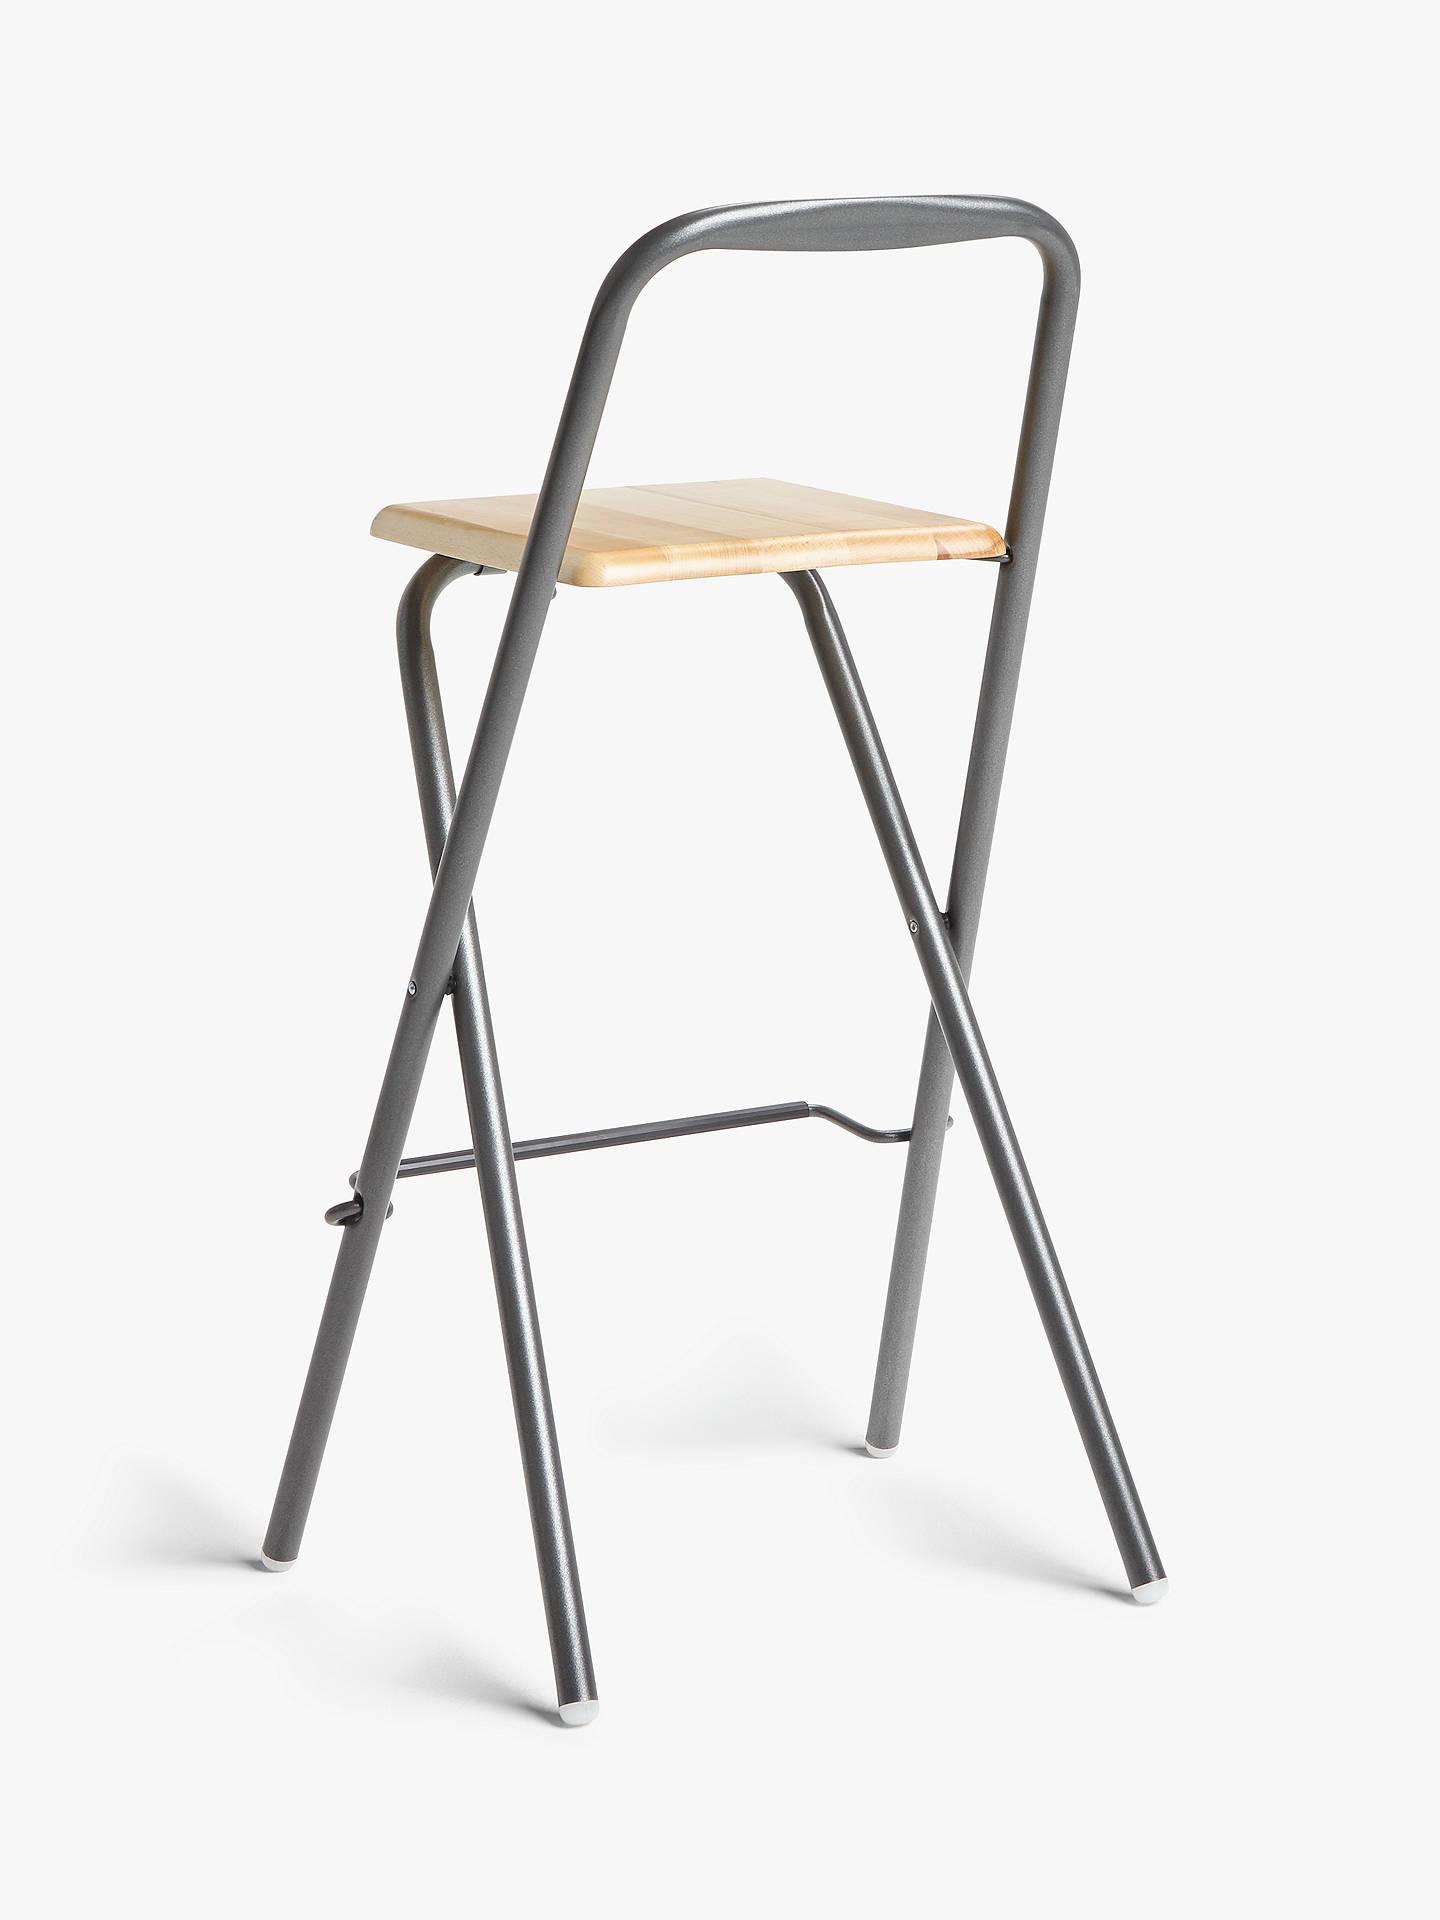 Peachy Fiam Folding Bar Stool Grey Alphanode Cool Chair Designs And Ideas Alphanodeonline